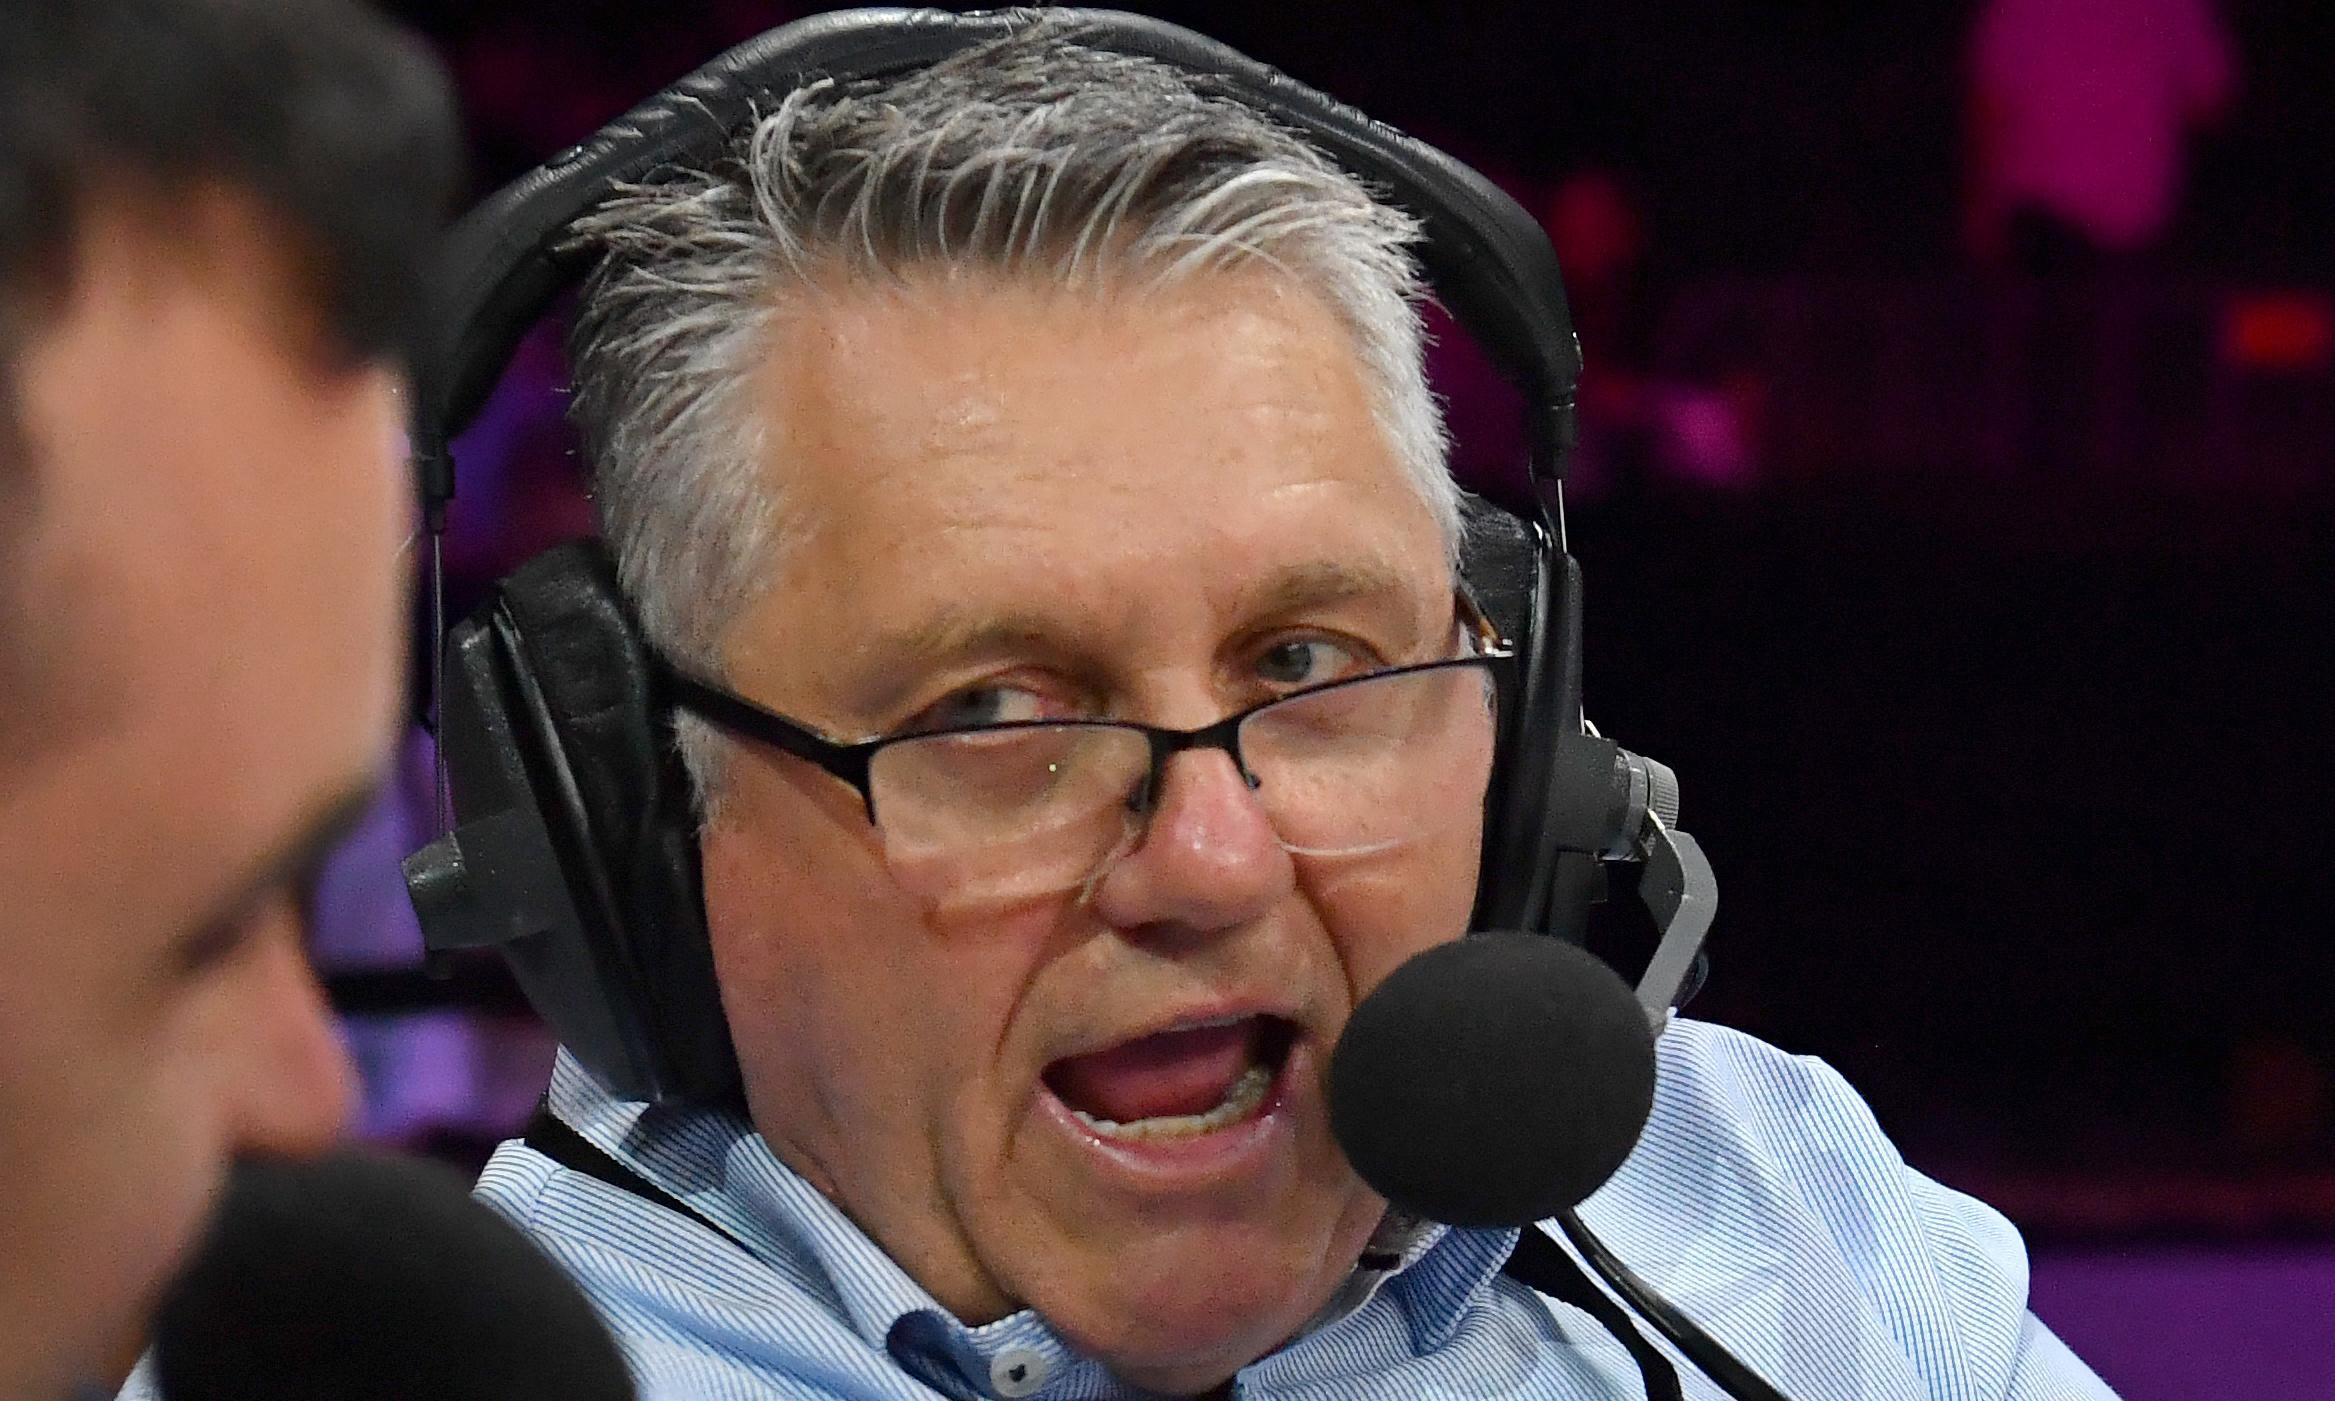 Nine says it won't change 2GB lineup of Alan Jones and Ray Hadley in $114m bid for Macquarie Media